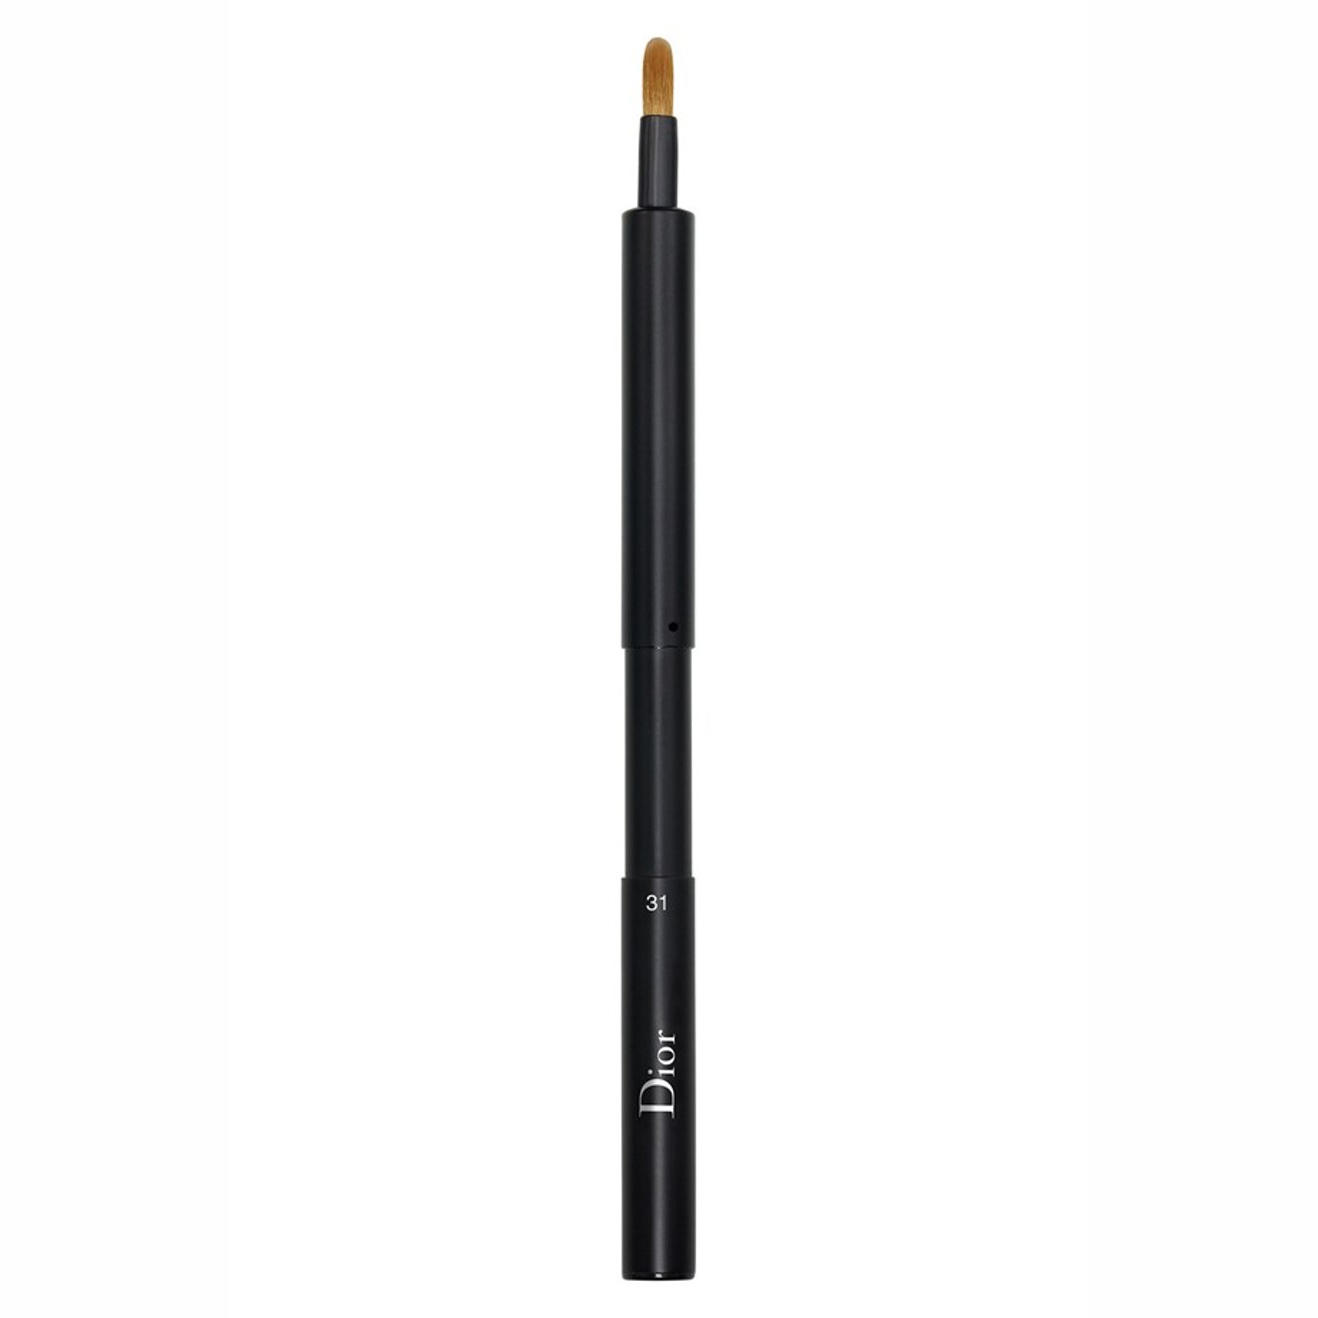 Dior Professional Finish Lip Brush 31